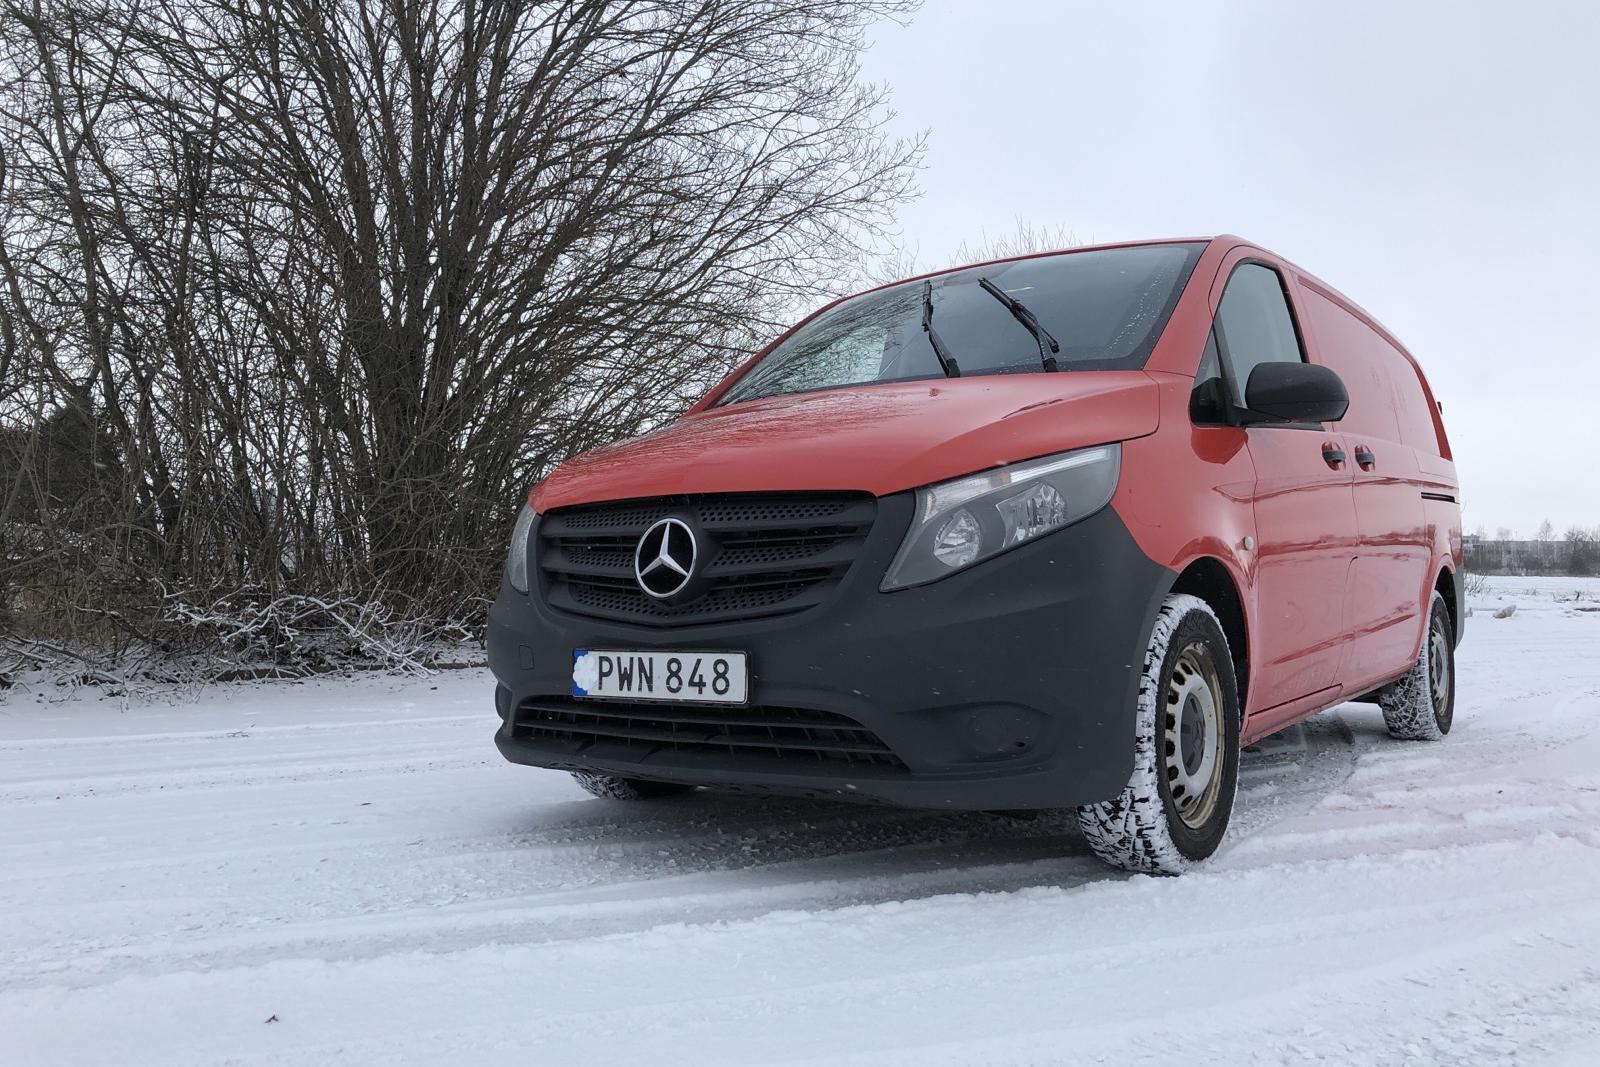 Mercedes Vito 111 CDI W640 (114hk) - 19 470 mil - Manuell - röd - 2015